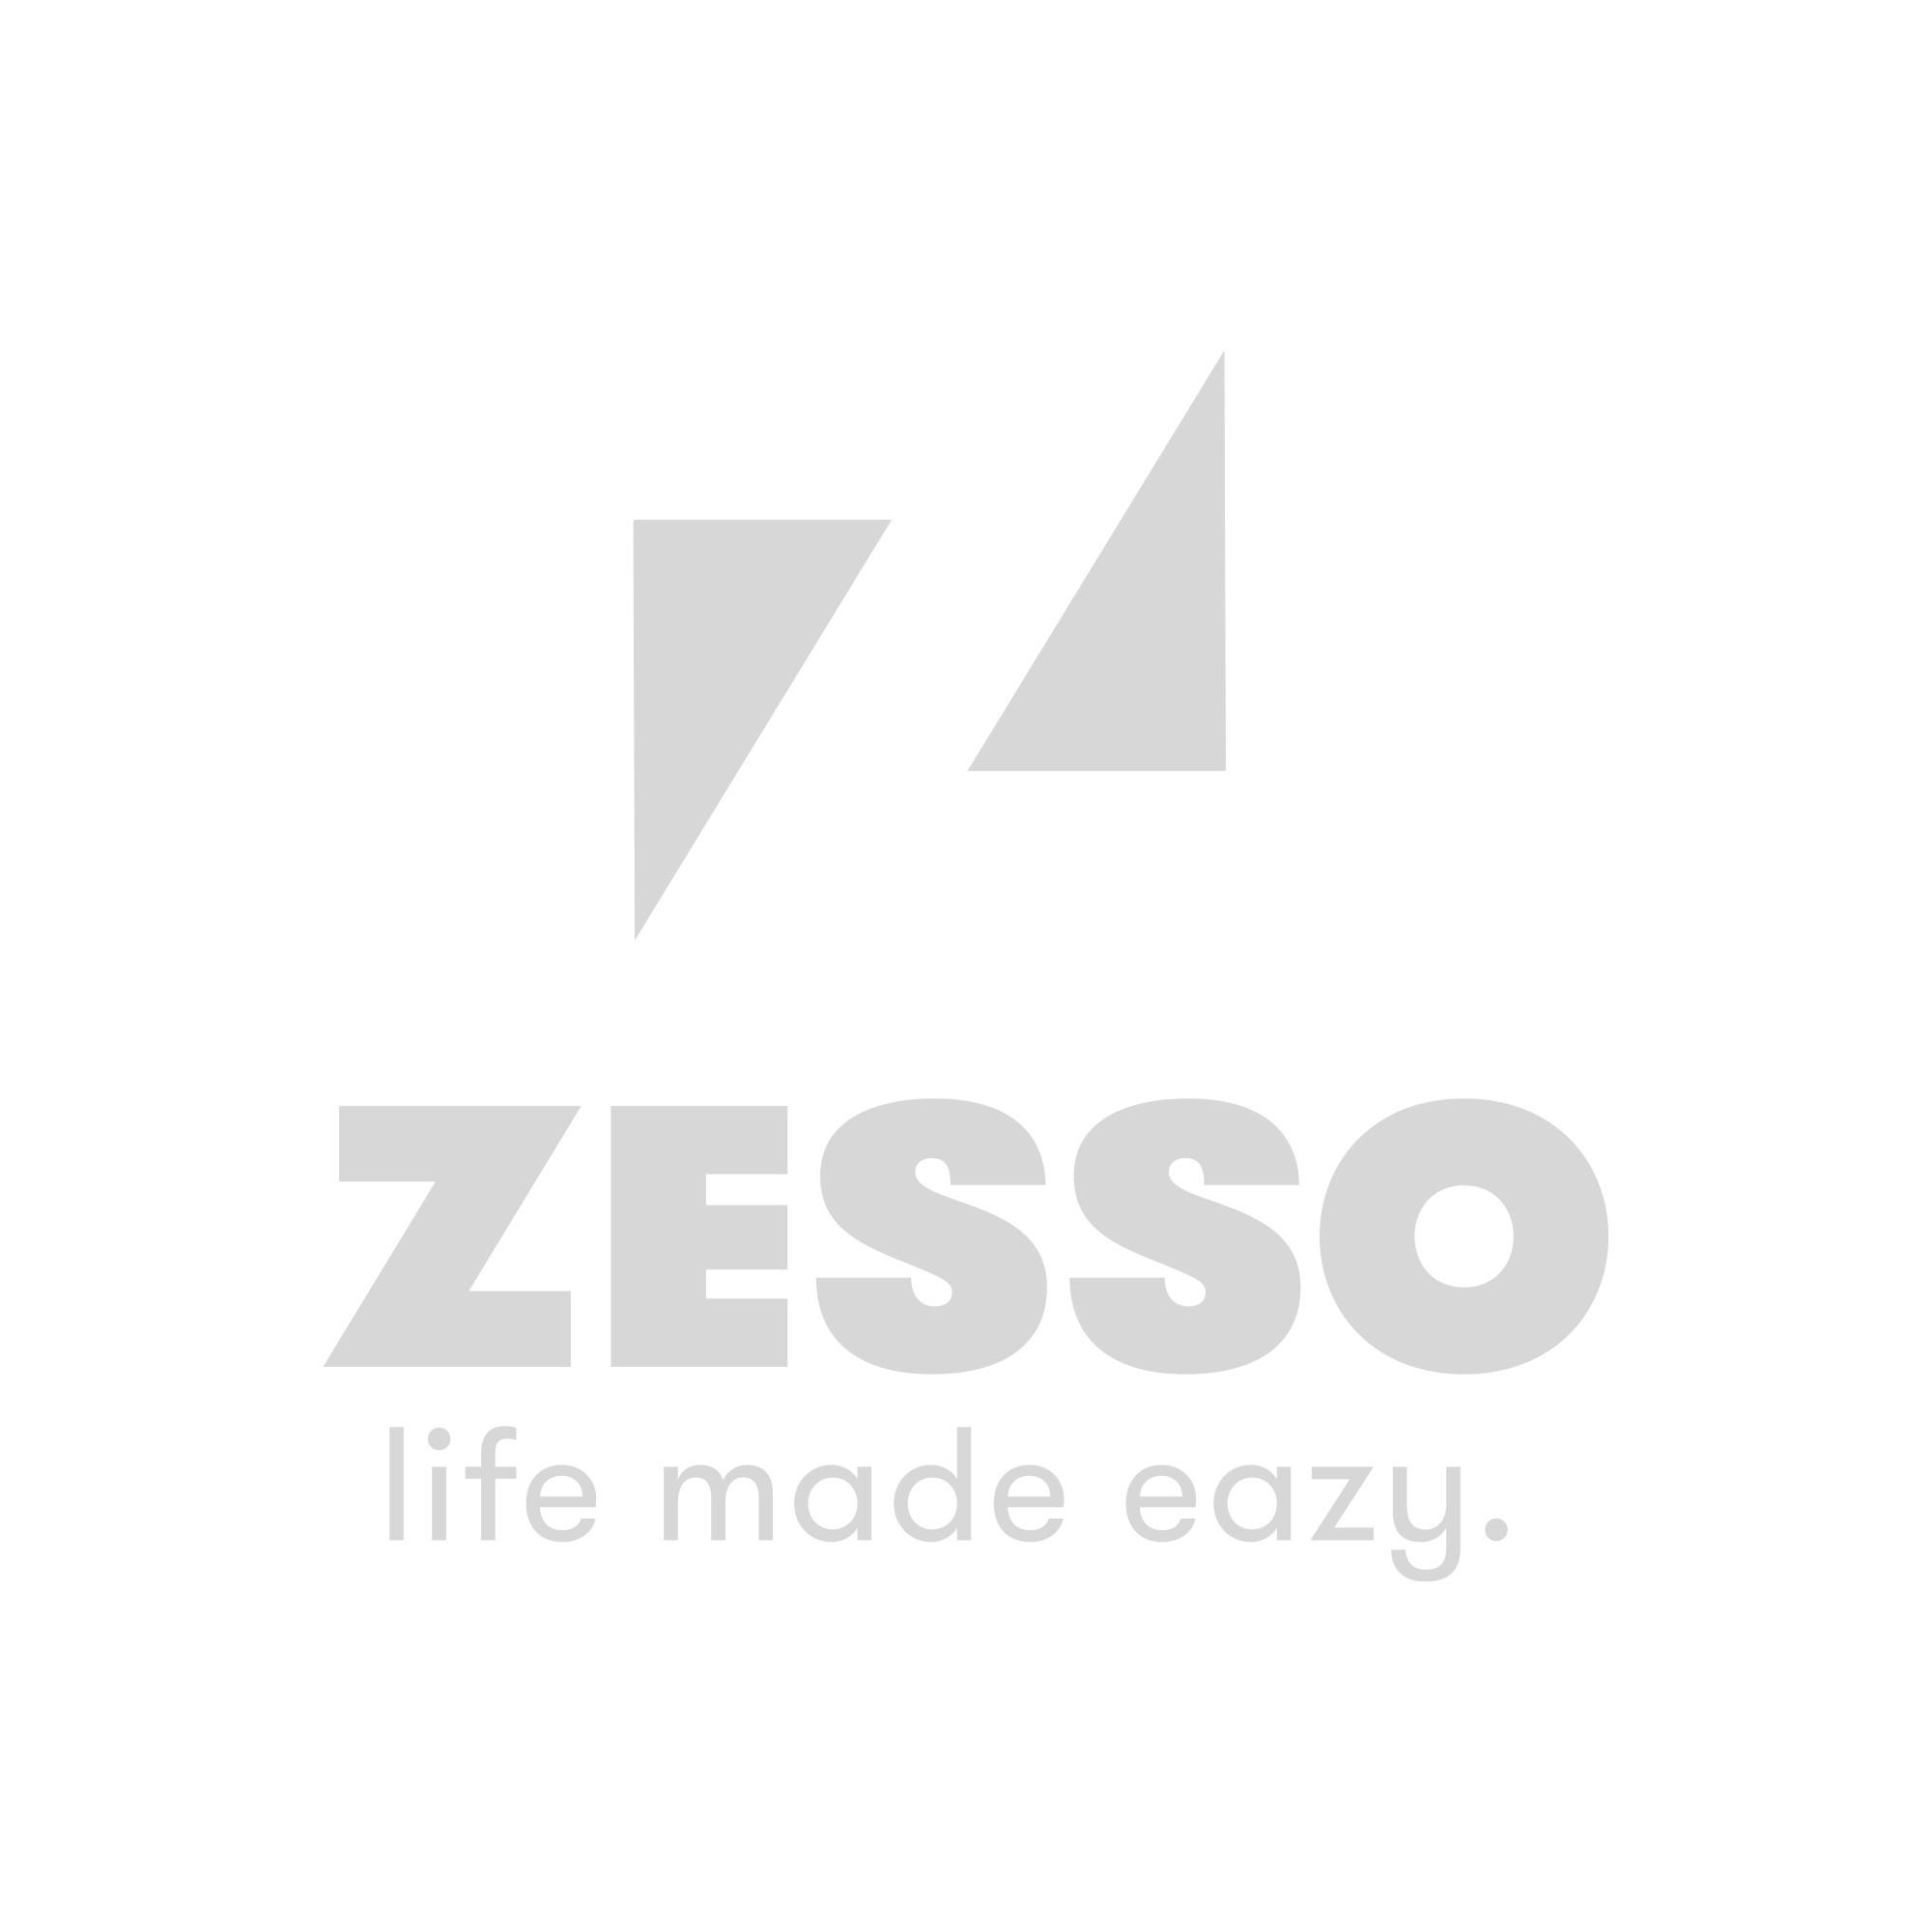 Baninni Loopstoel Presto 3-in-1 Wit - Zwart